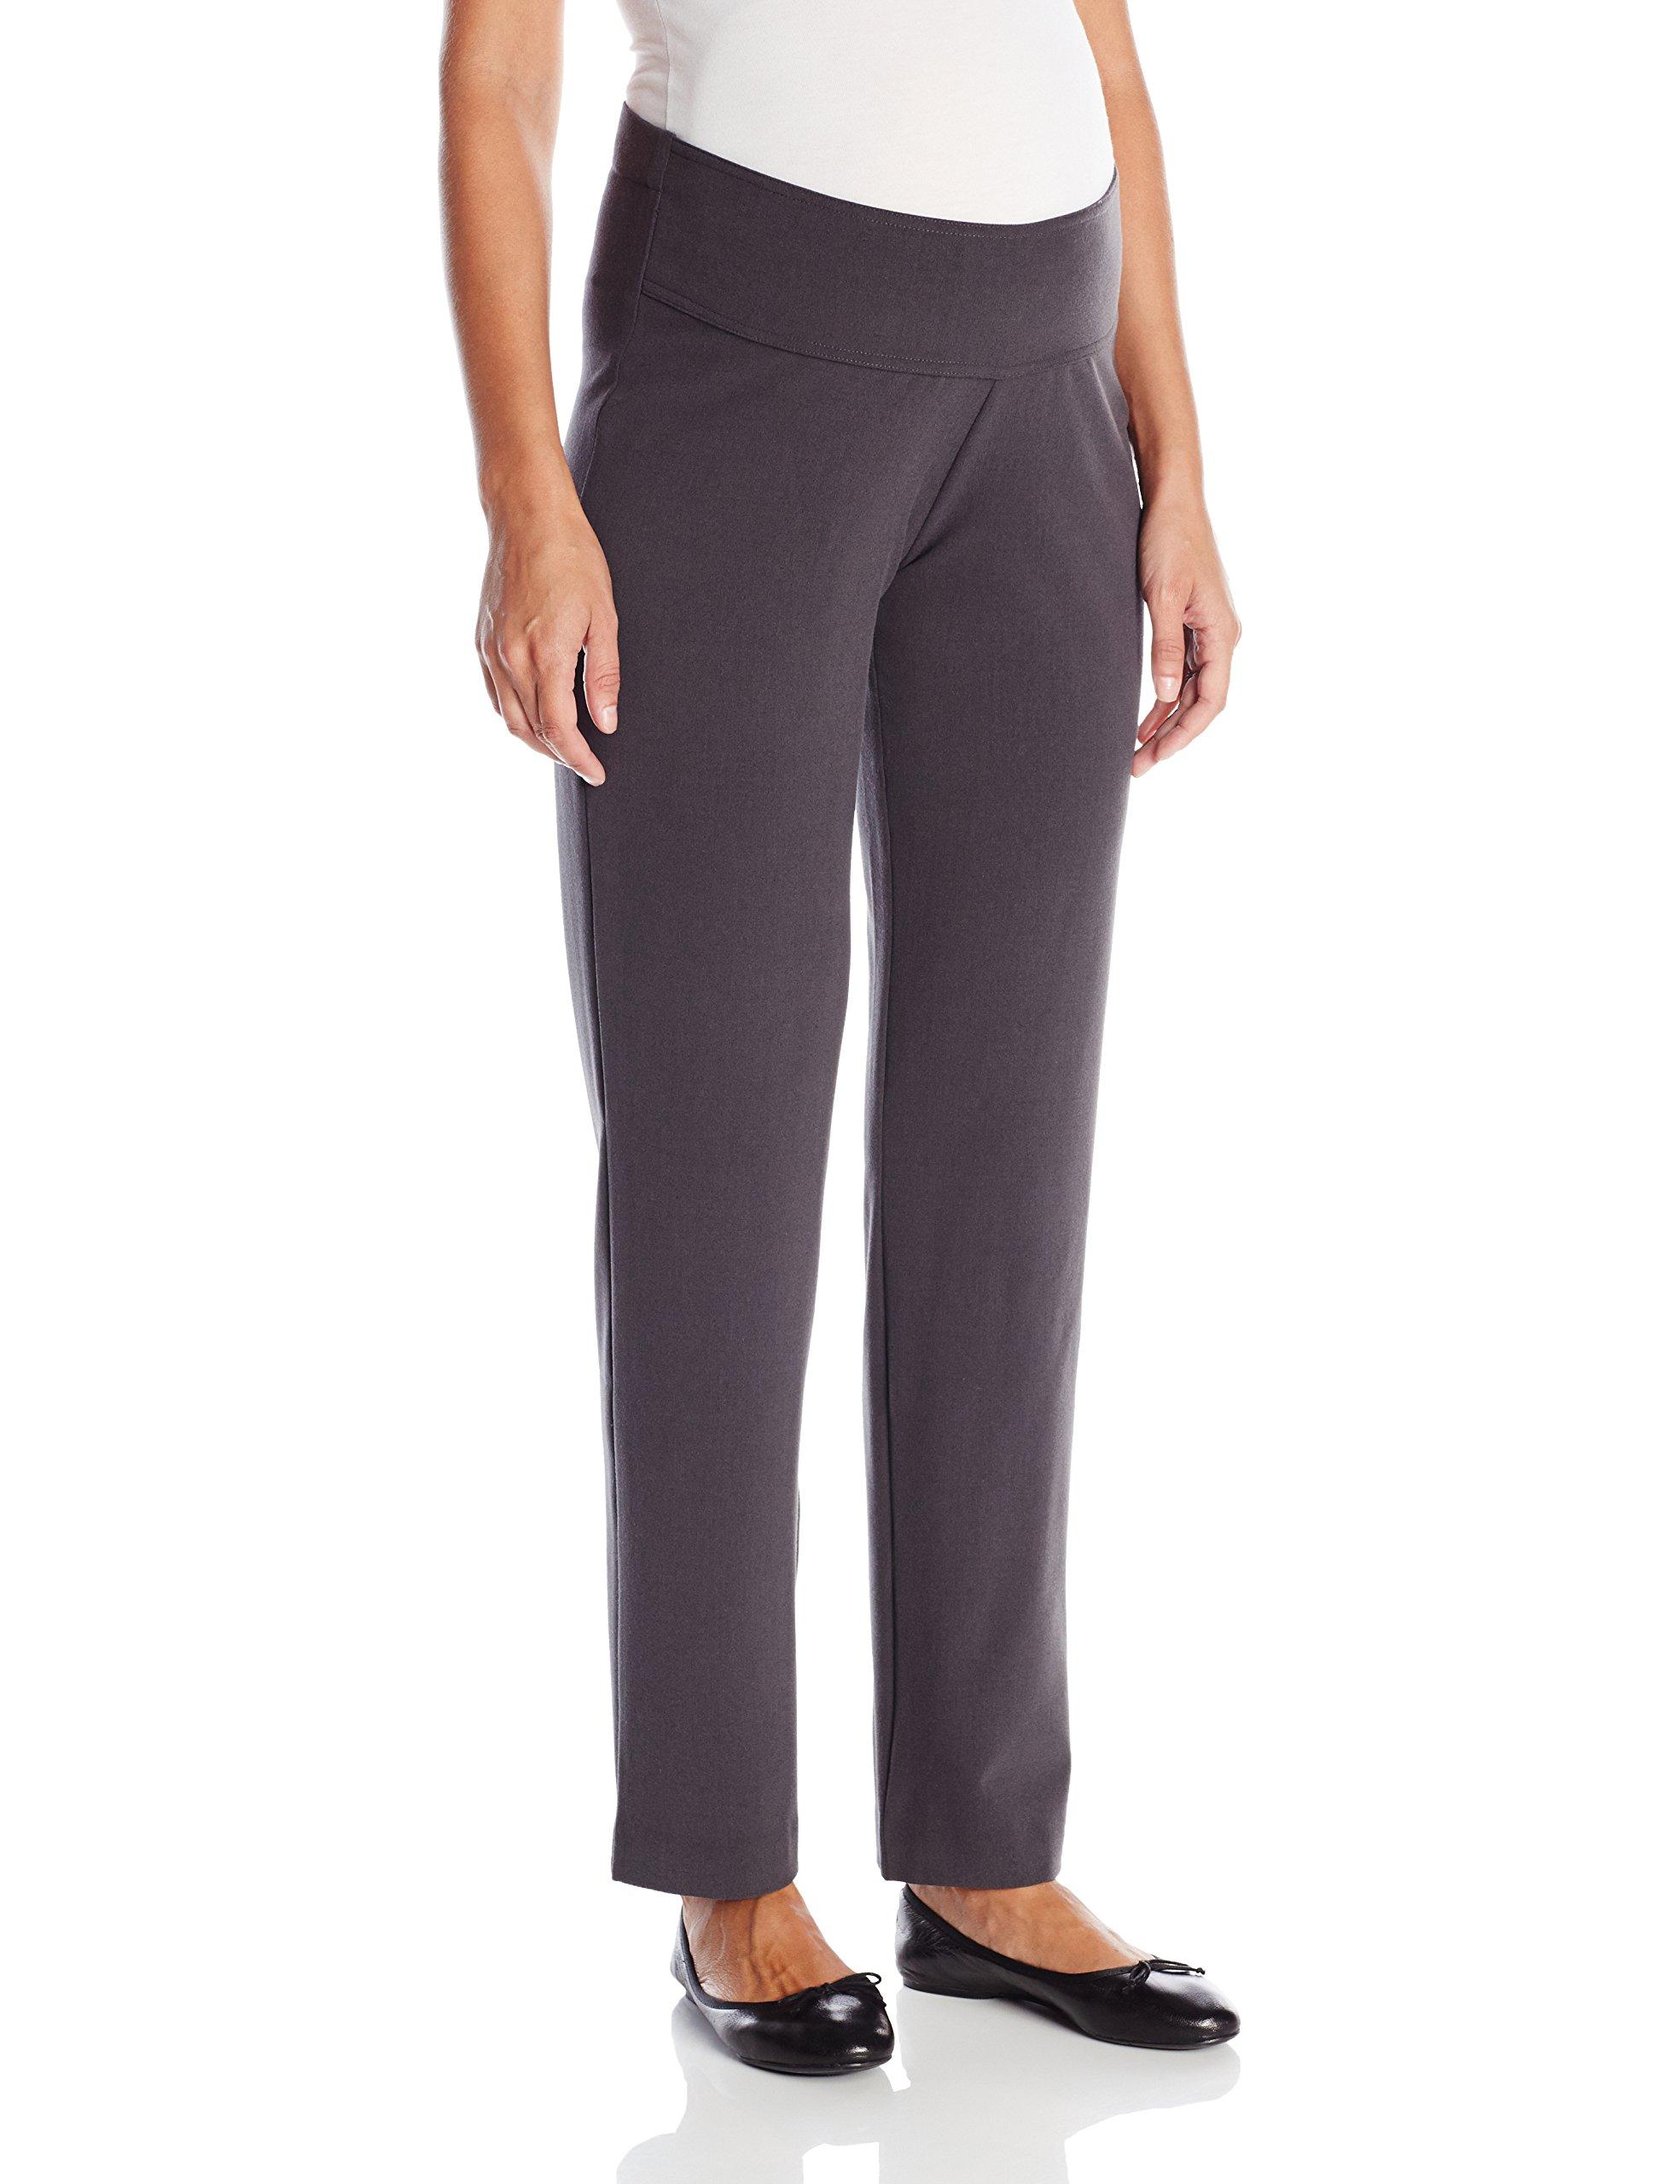 Ripe Maternity Women's Maternity Lancaster Straight Leg Work Suit Pant, Dark Charcoal, Medium by Ripe